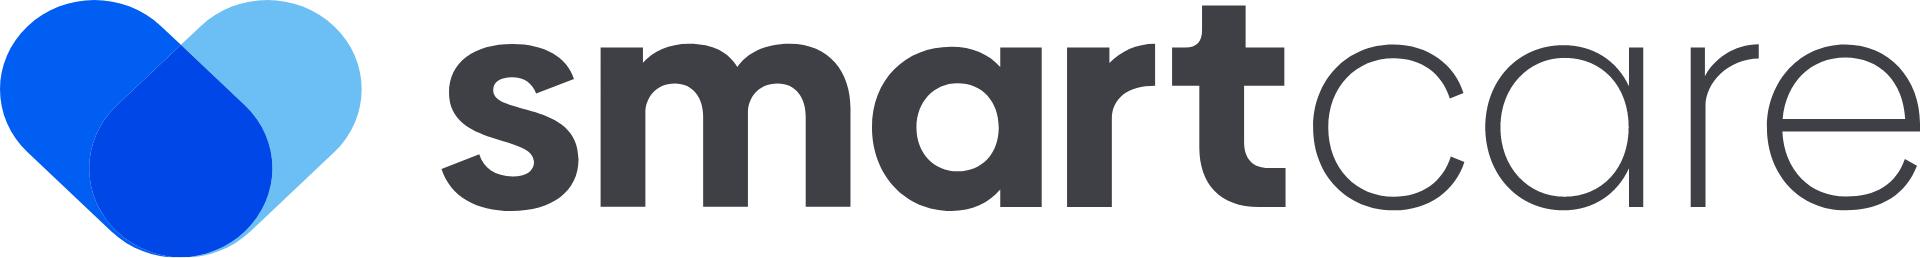 SMARTcare Software Logo